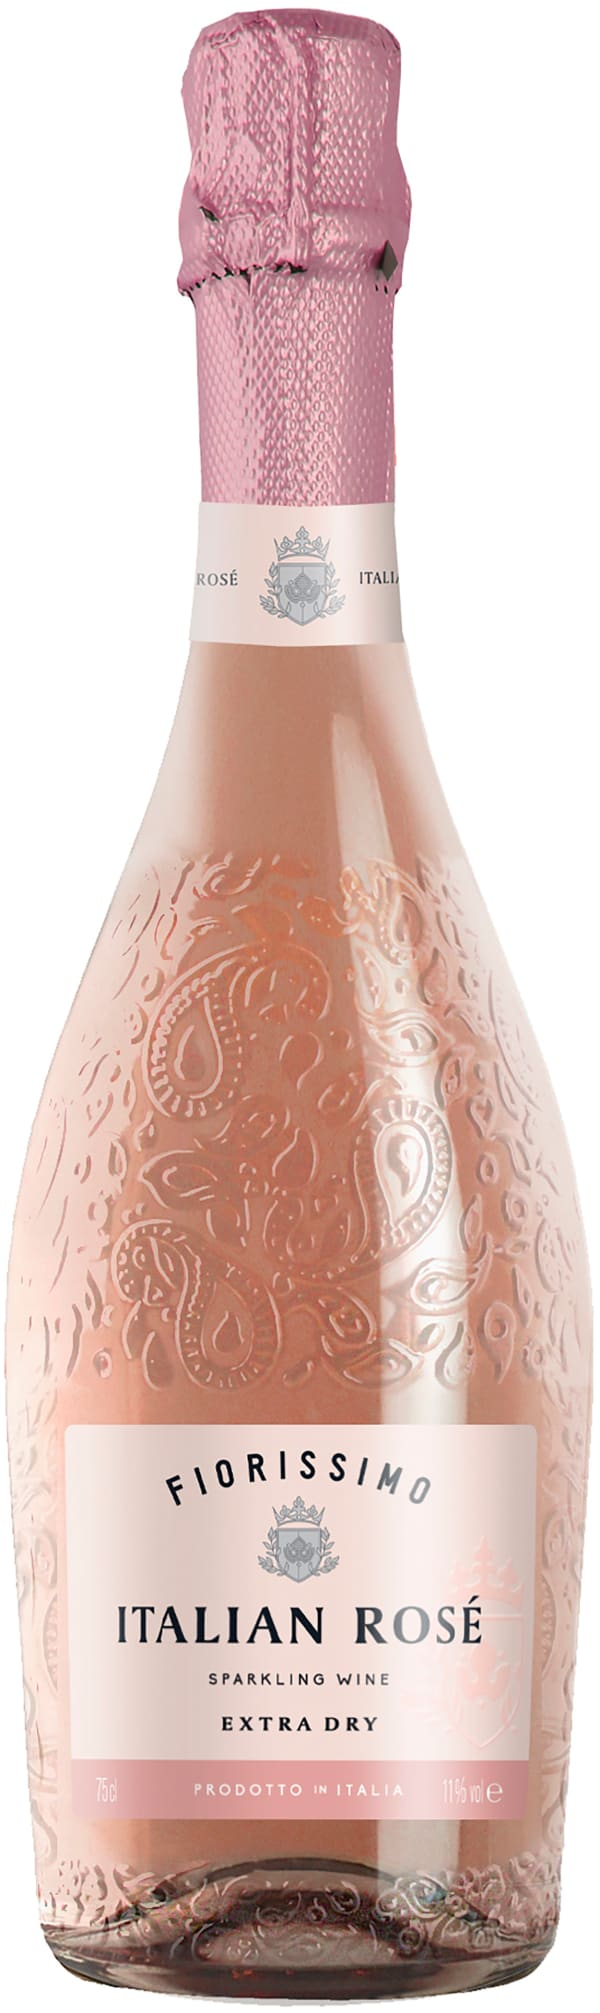 Fiorissimo Italian Rosé Sparkling Wine Extra Dry